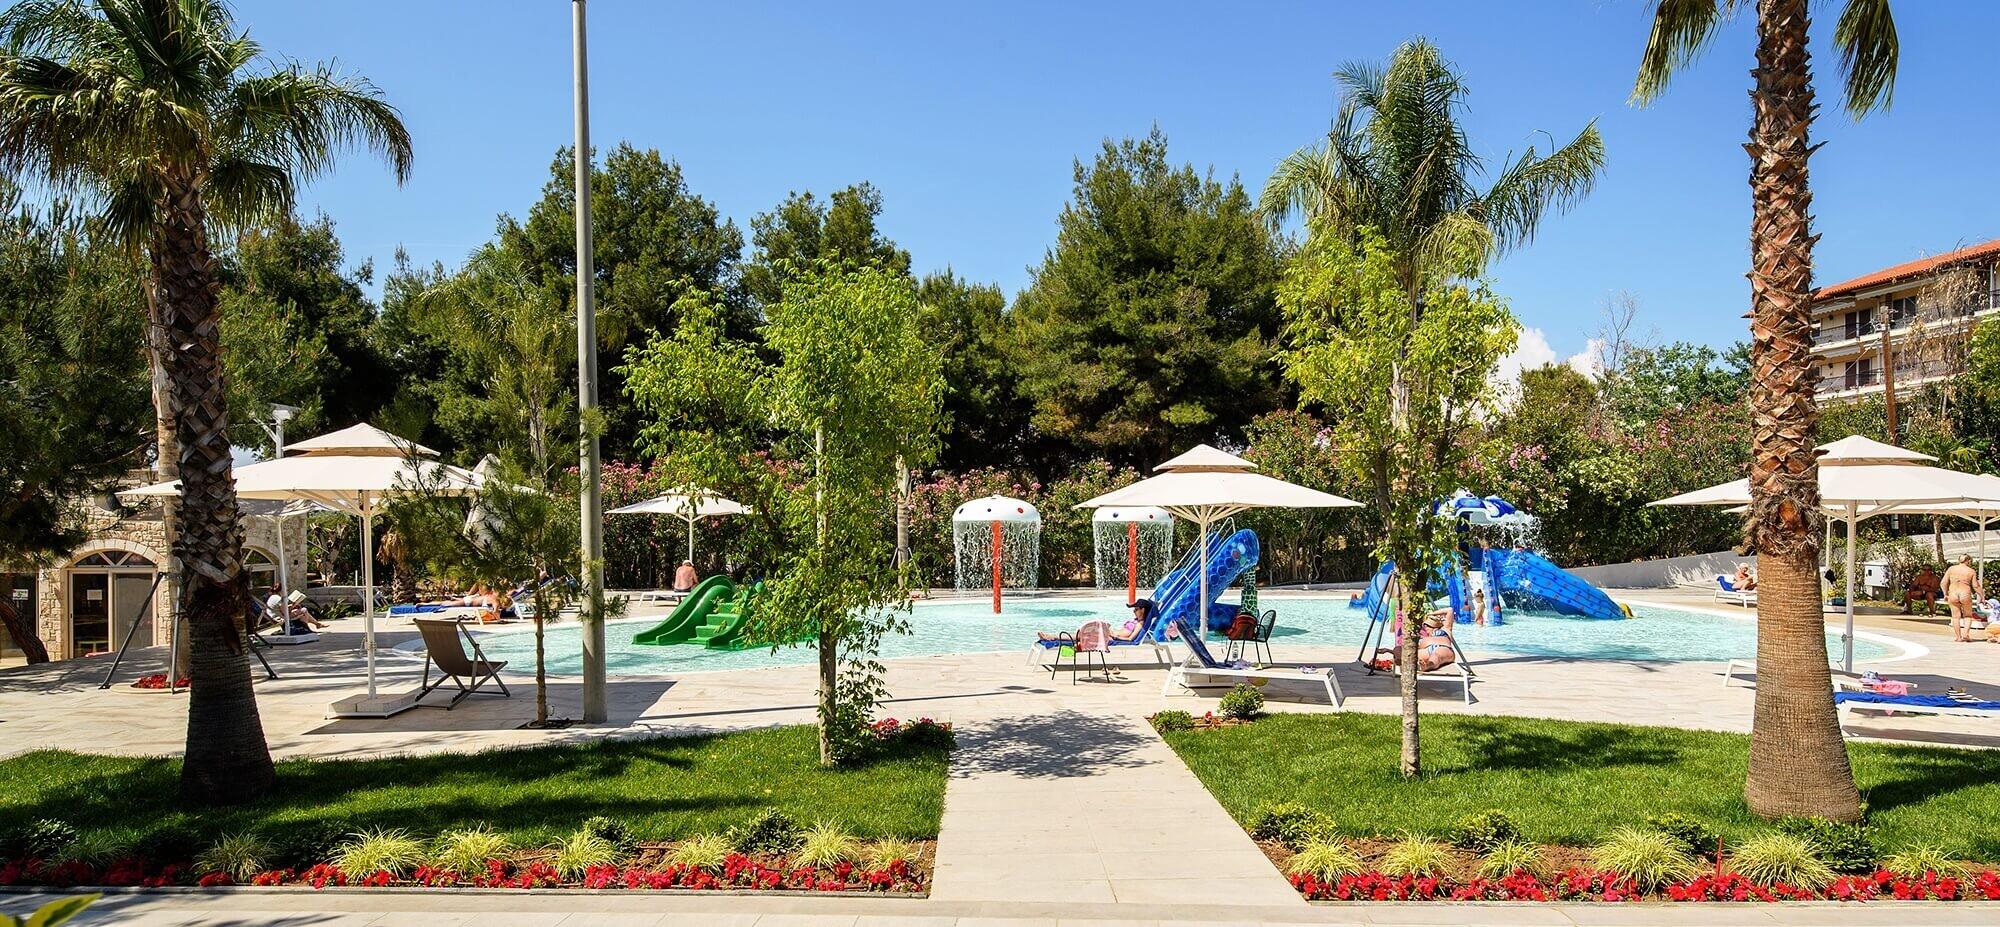 Portes Beach Hotel - басейн и аквапарк